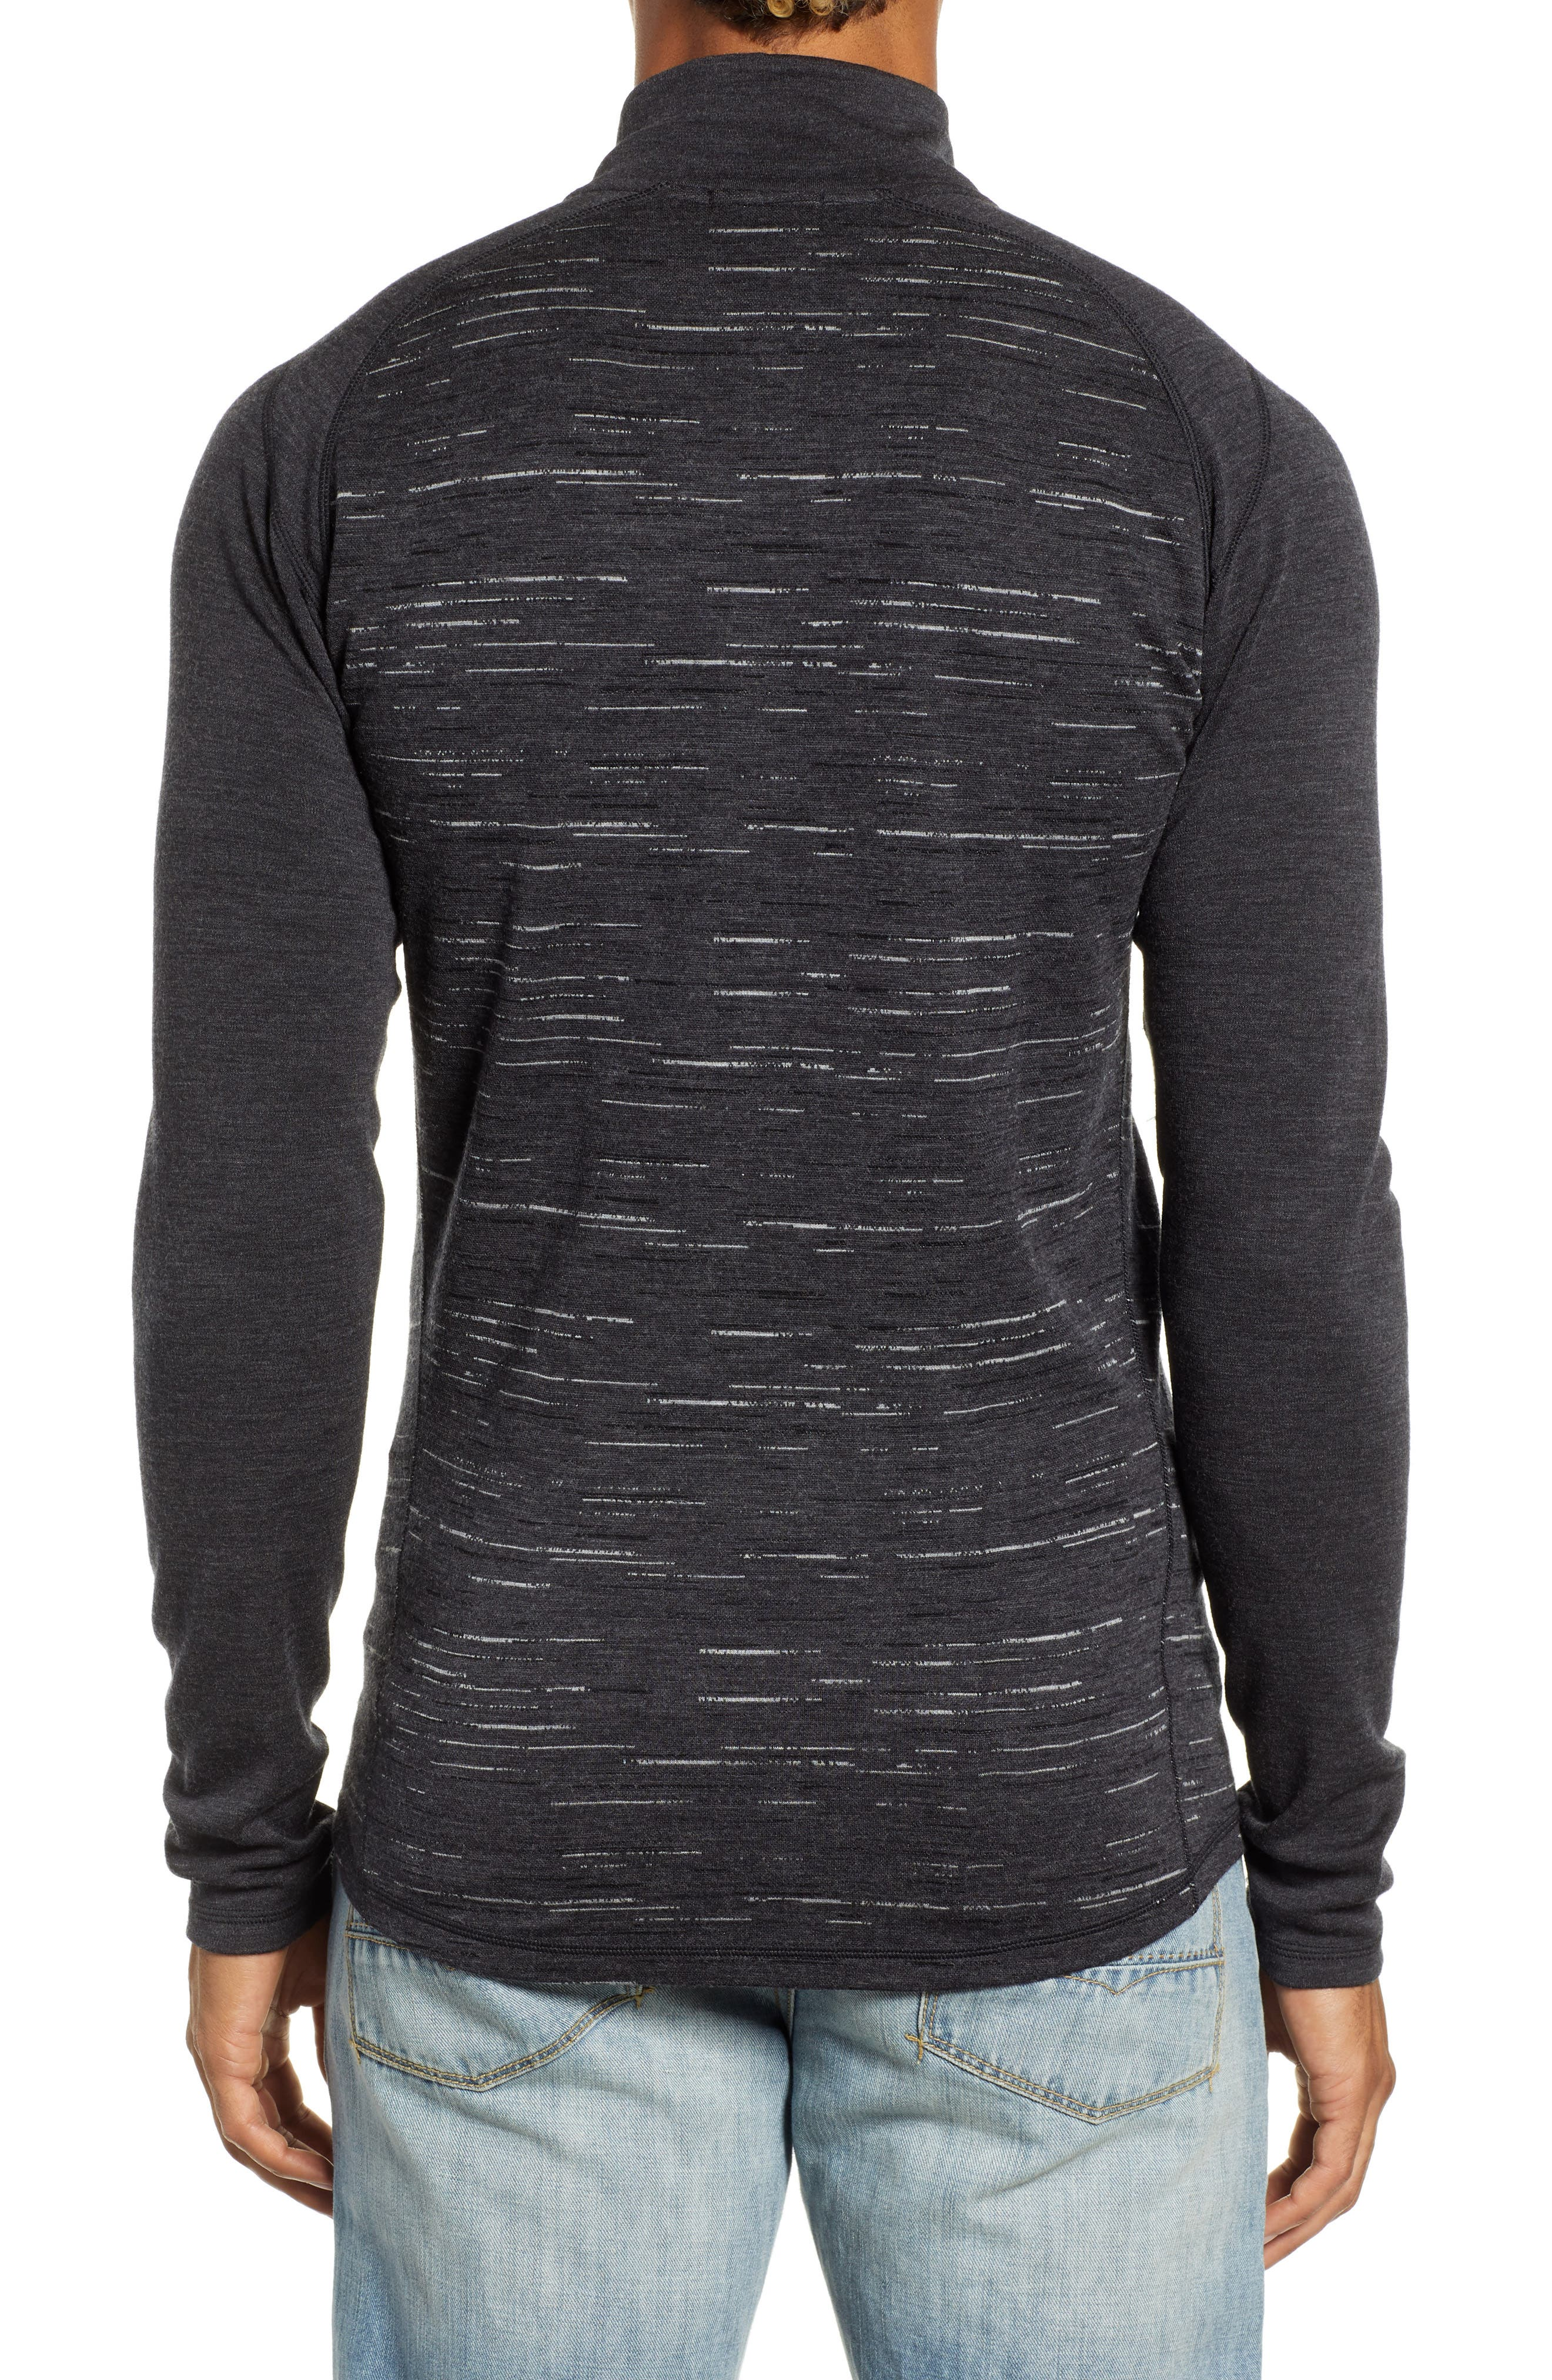 SMARTWOOL,                             Merino 250 Base Layer Pattern Quarter Zip Pullover,                             Alternate thumbnail 2, color,                             CHARCOAL/ BLACK